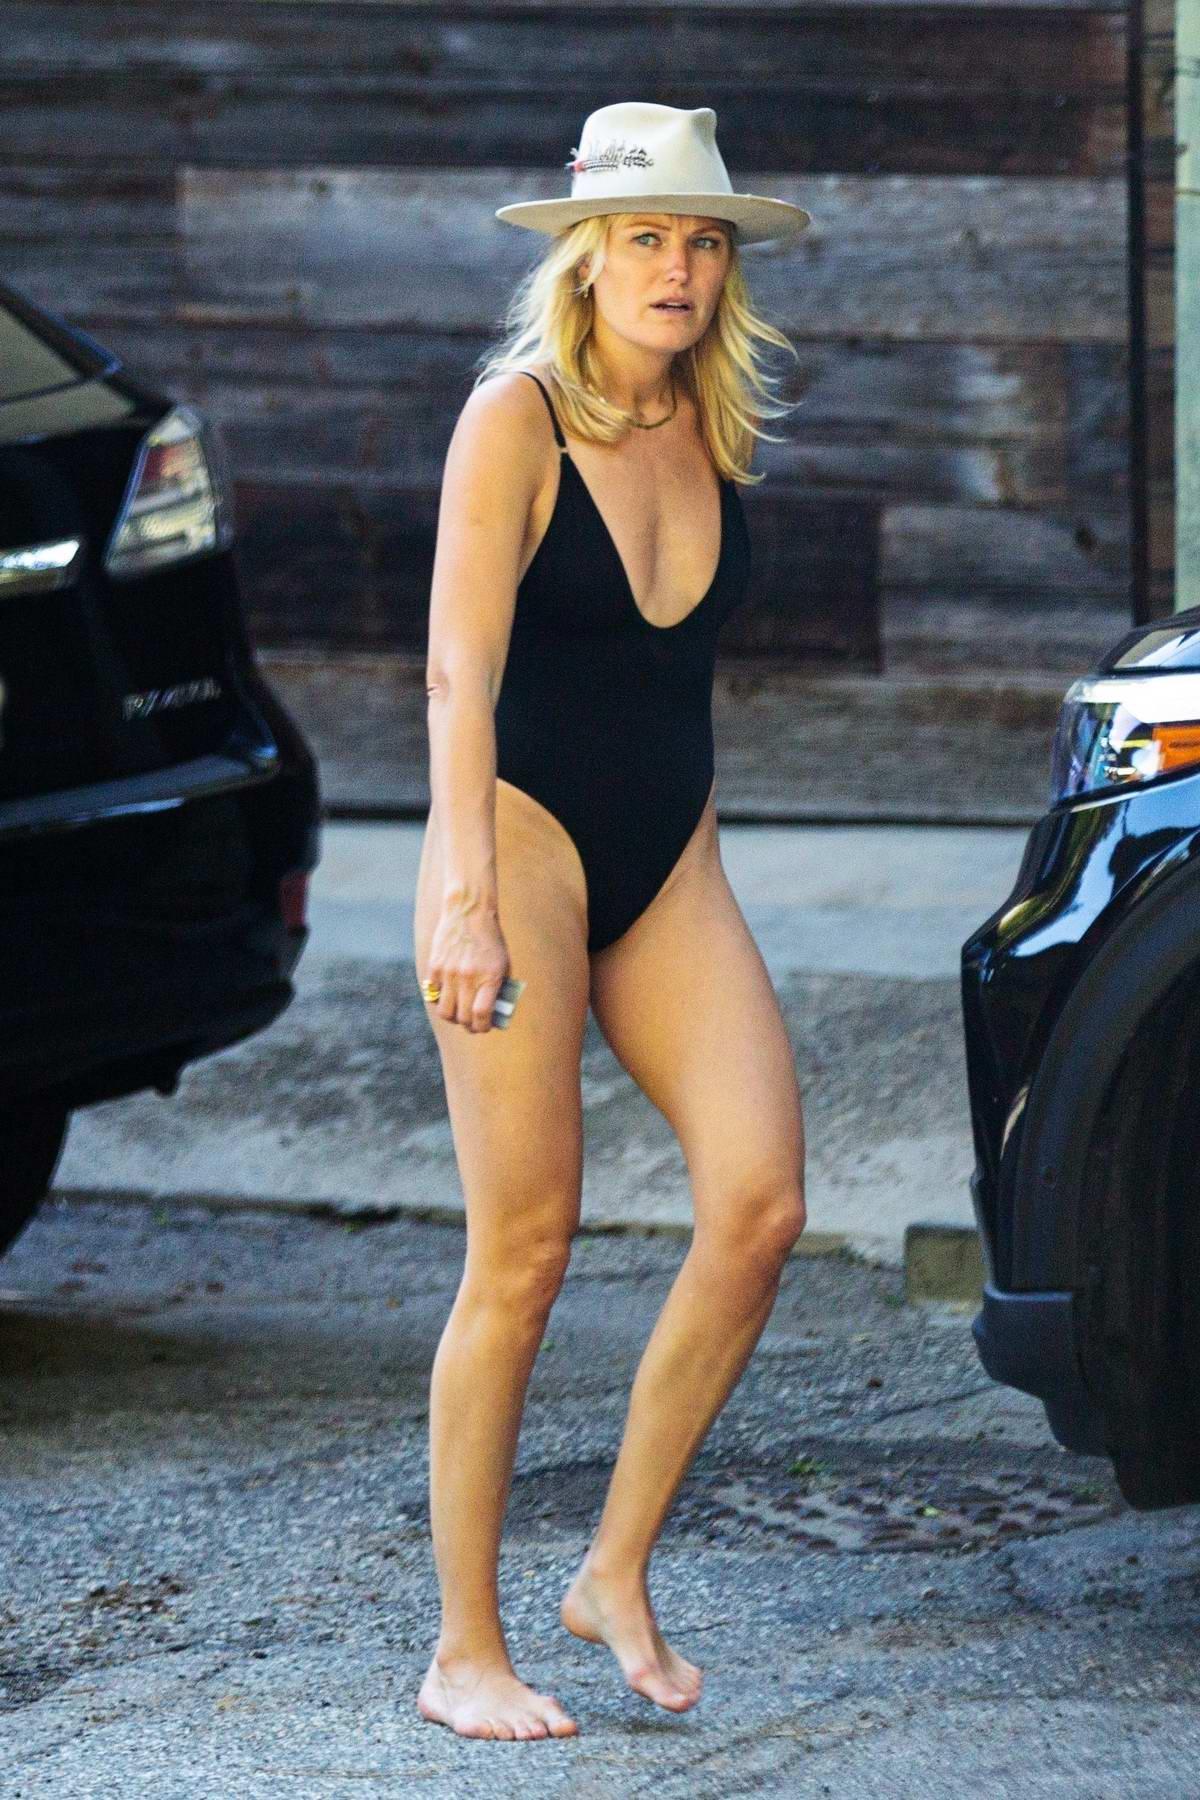 Malin Akerman seen wearing a black swimsuit as she steps outside her home in Los Angeles